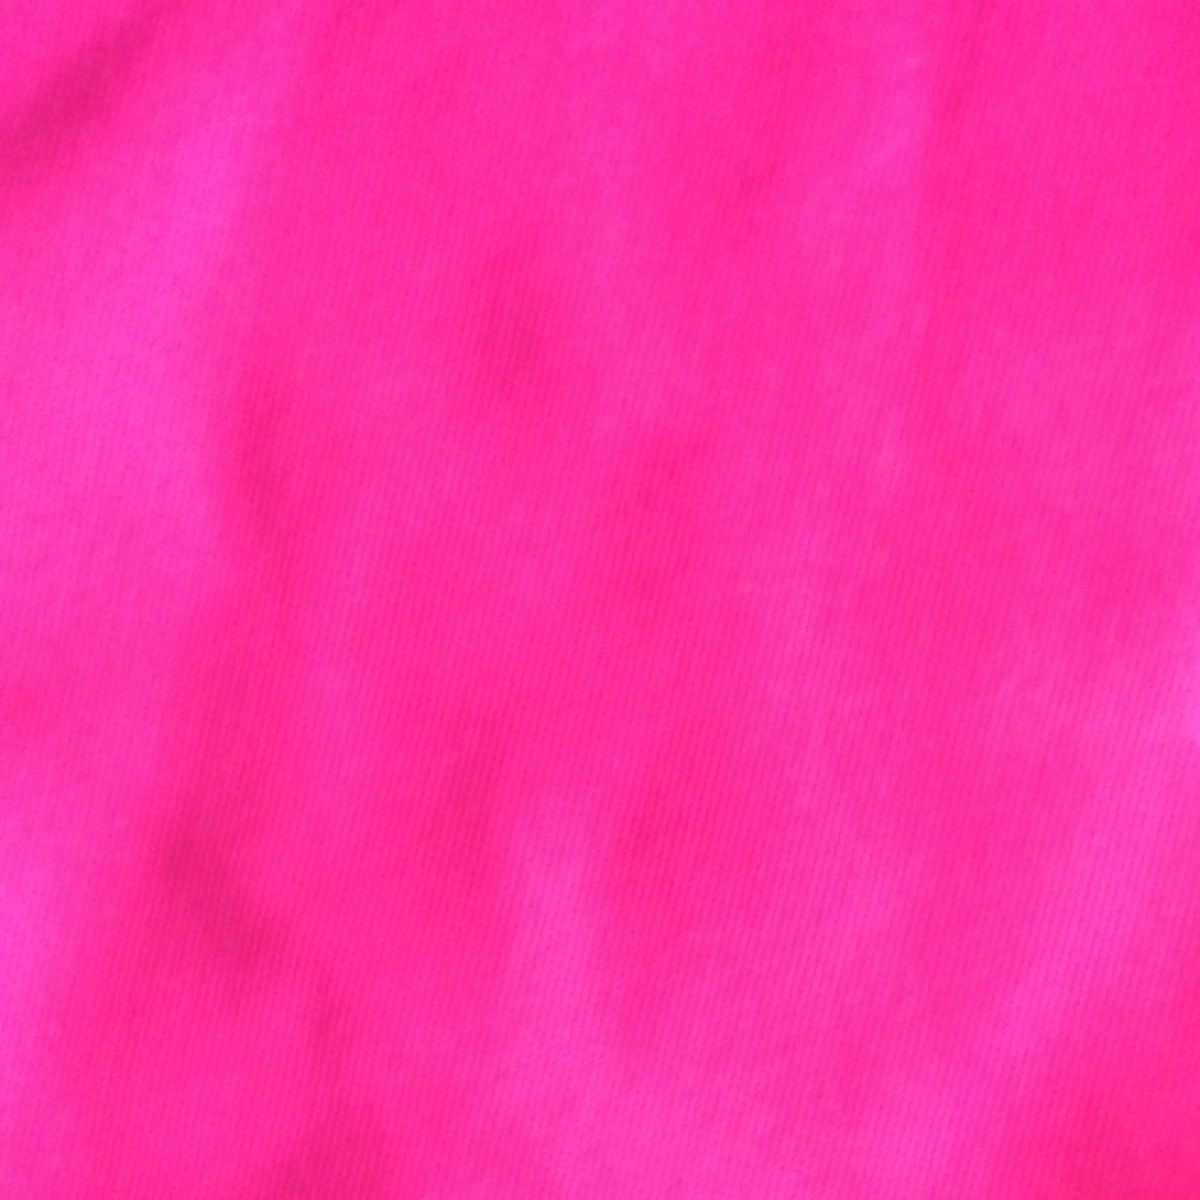 Solid Pink Wallpaper -...